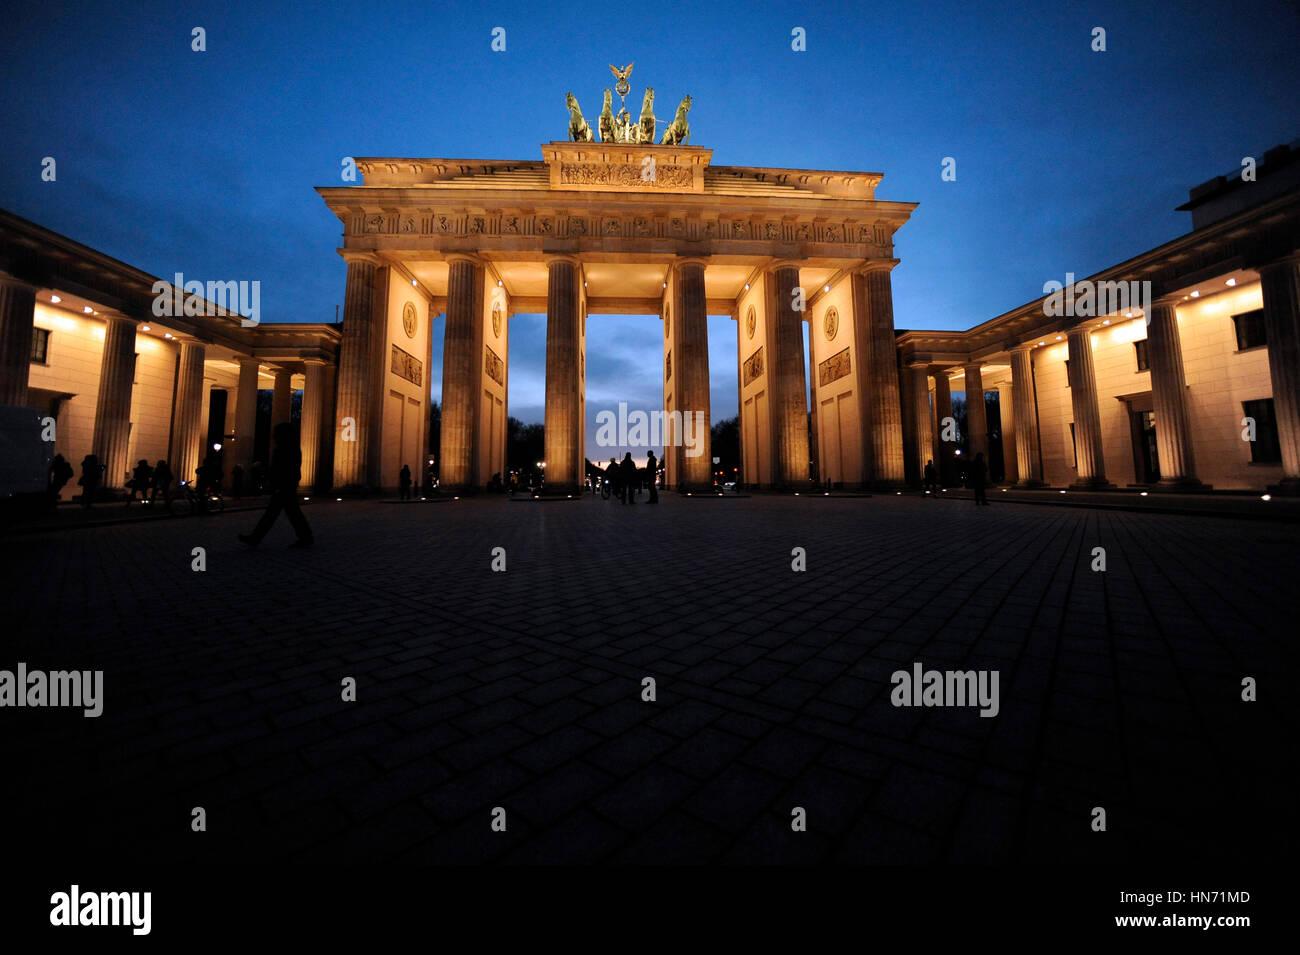 Puerta de Brandeburgo, Berlín Imagen De Stock